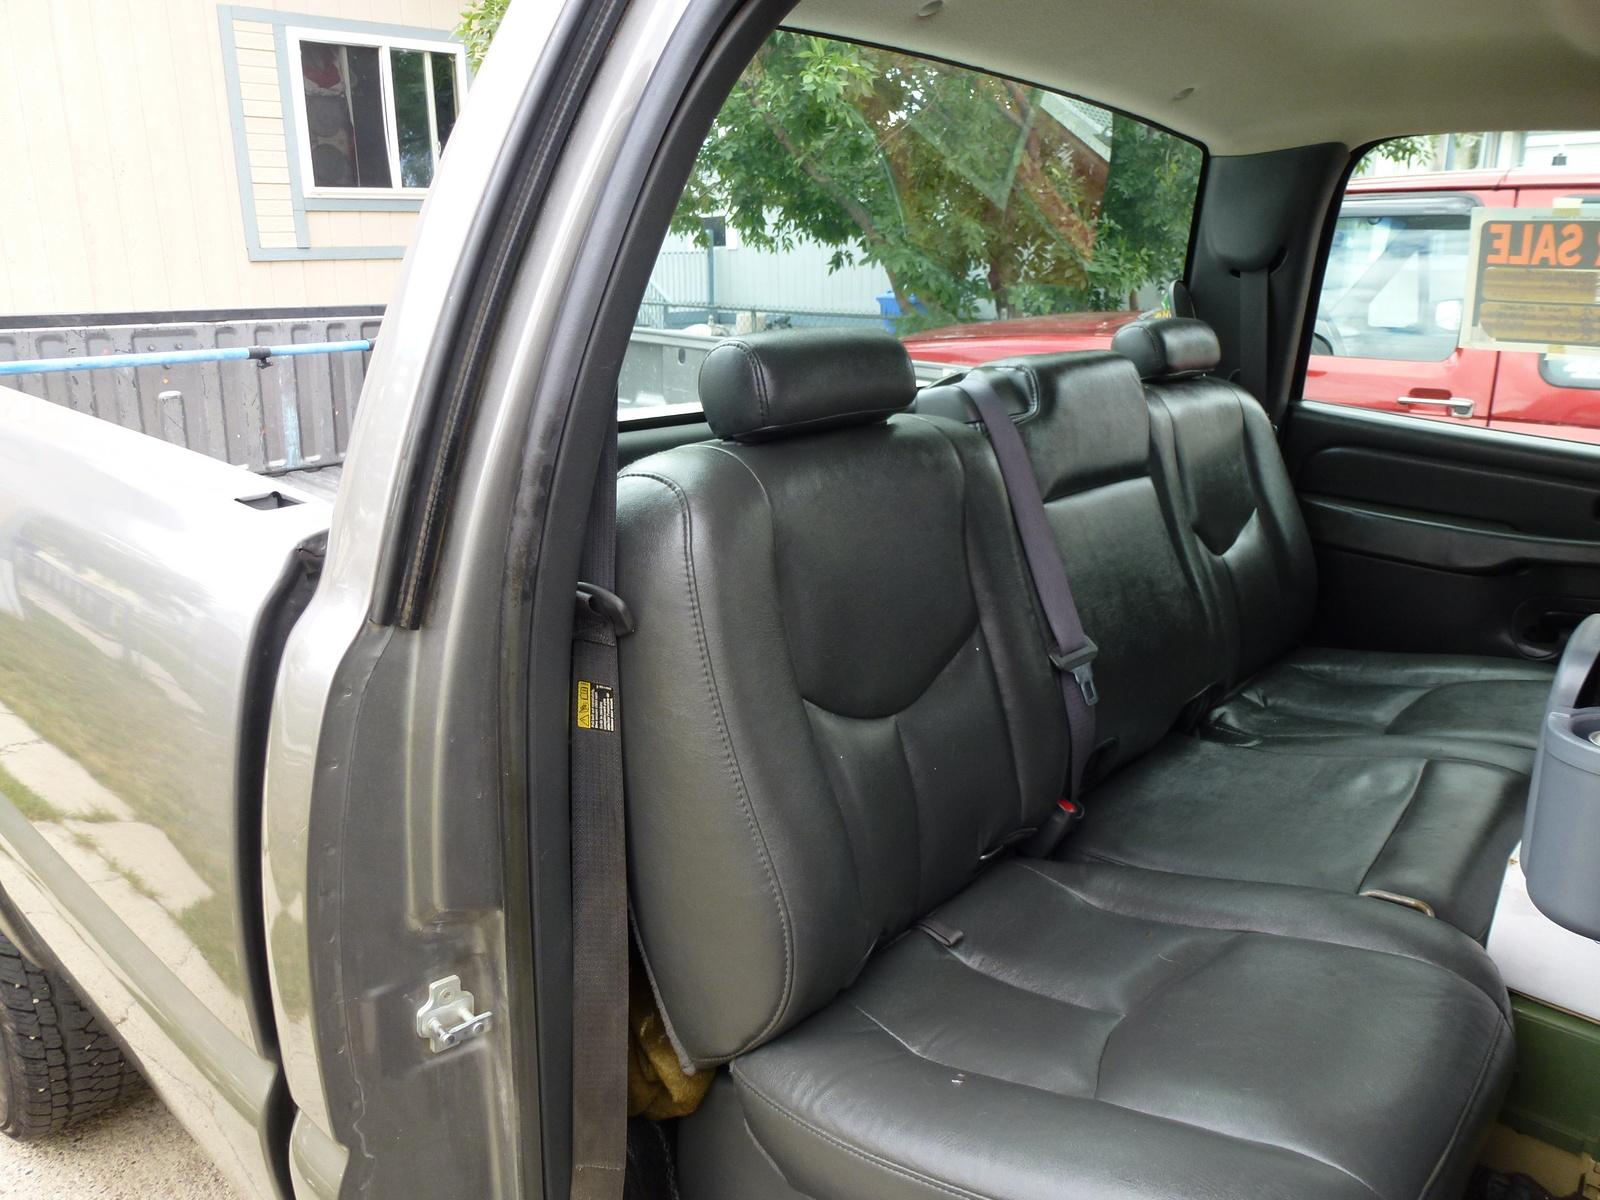 Picture of 2006 Chevrolet Silverado 3500 LS 4dr Crew Cab LB, interior